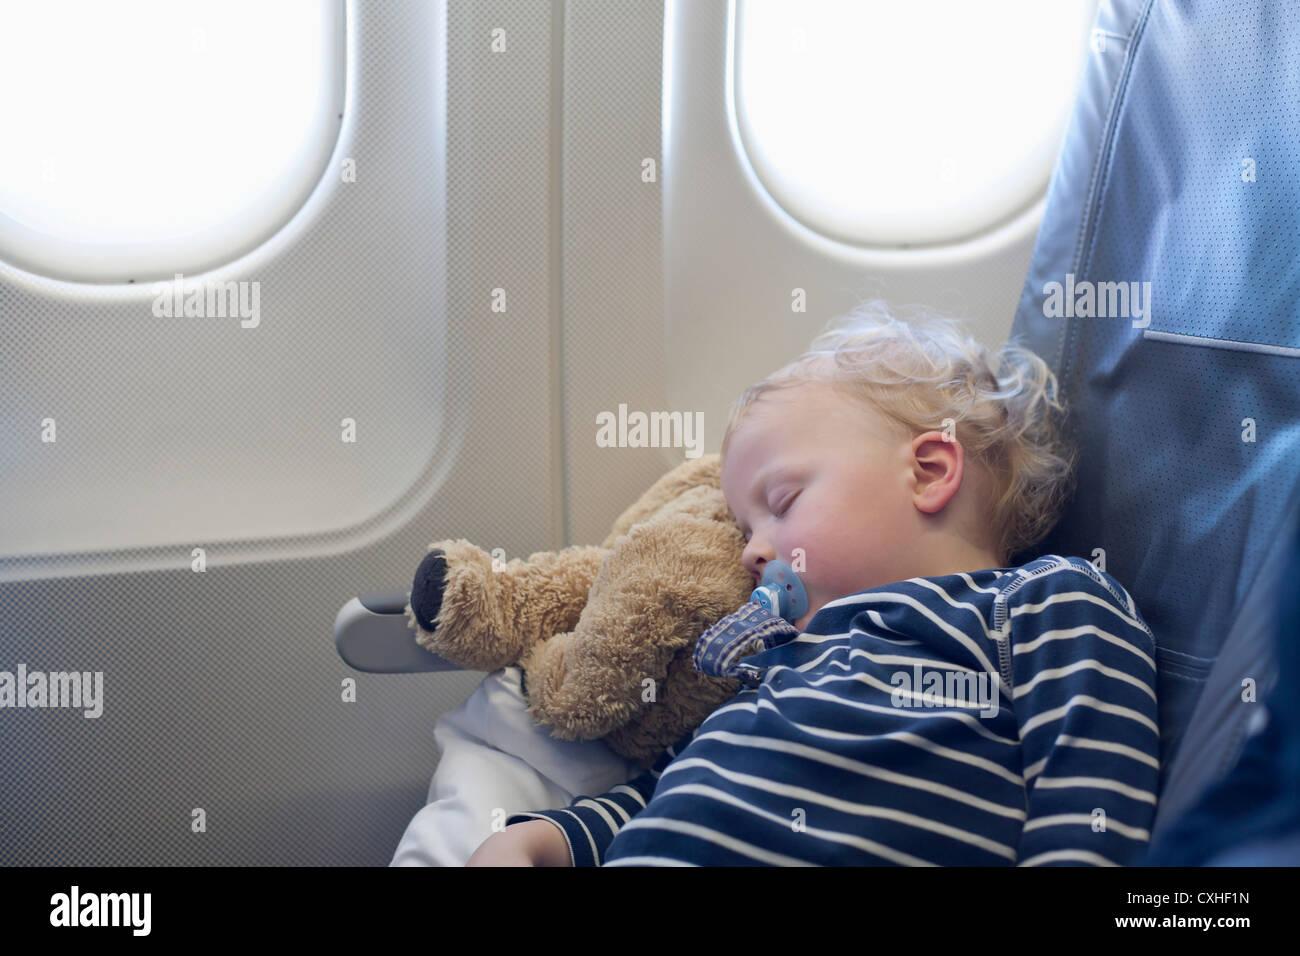 Germany, Boy sleeping in plane - Stock Image